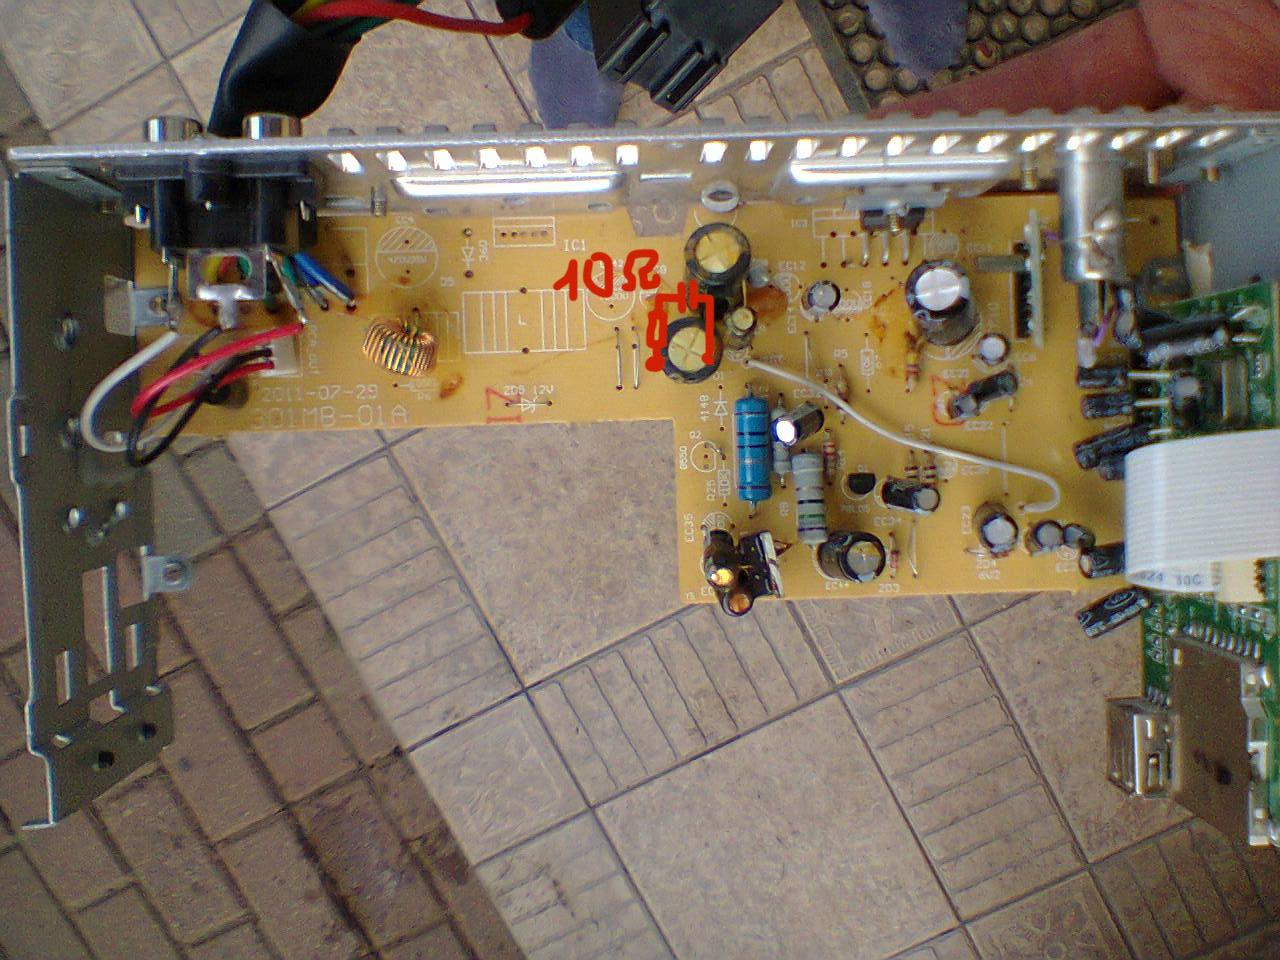 APOLLO GAMMA - Radio gra cicho, a na USB (mp3) bardzo g�o�no